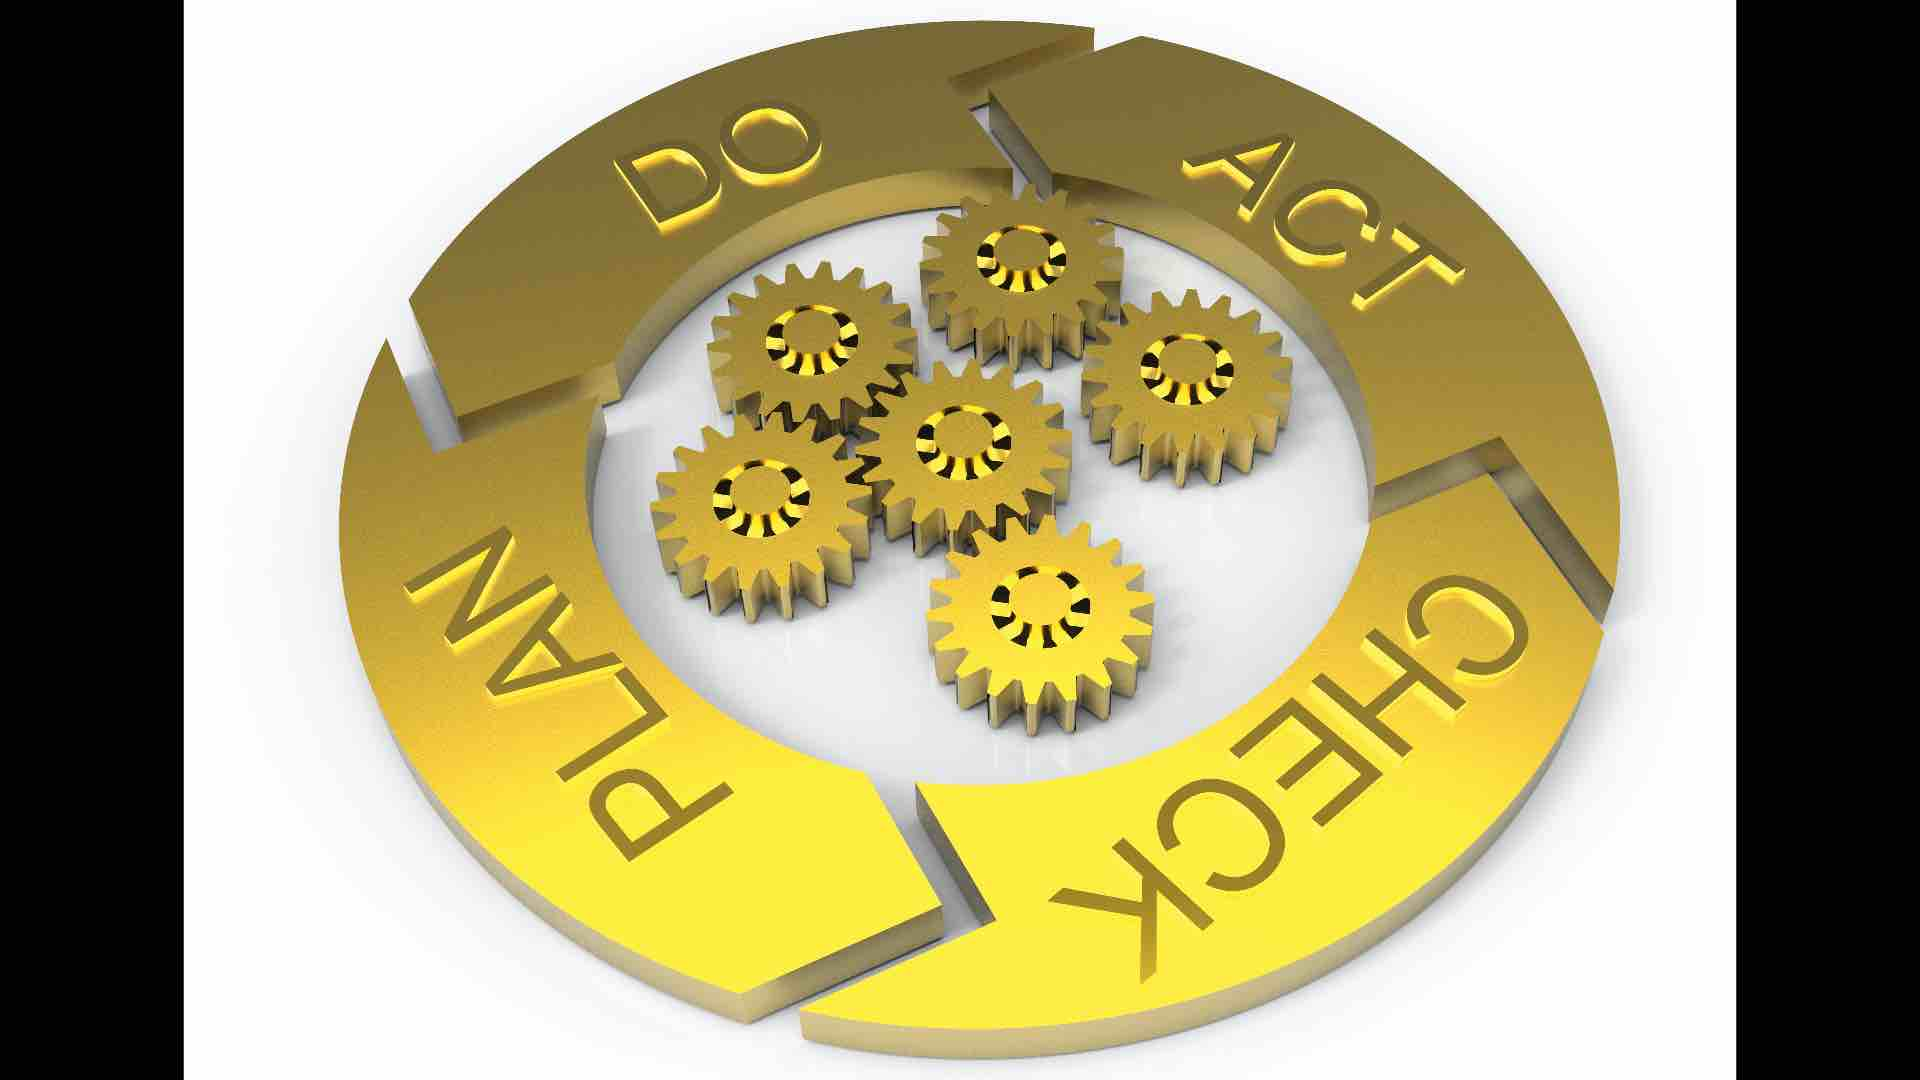 Preparing for Management Systems Audit